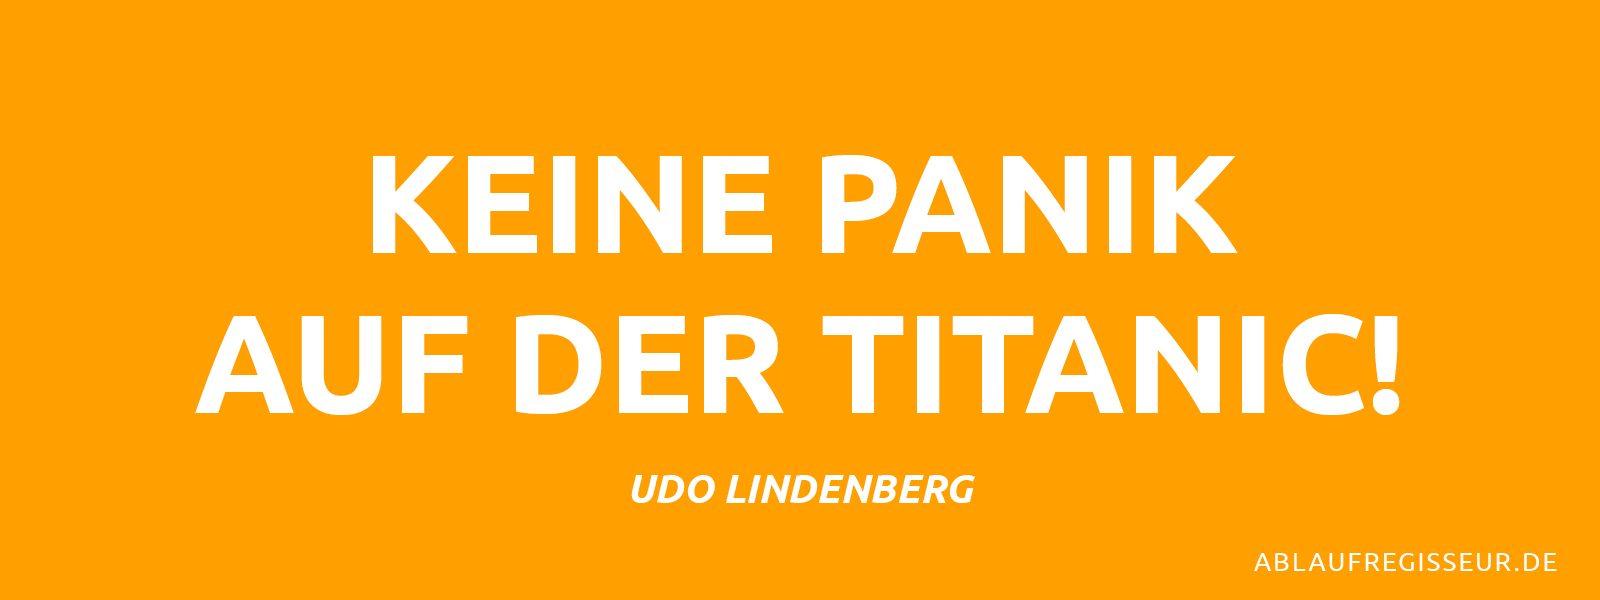 Zitate udo lindenberg choice image die besten zitate ideen - Tabaluga zitate ...